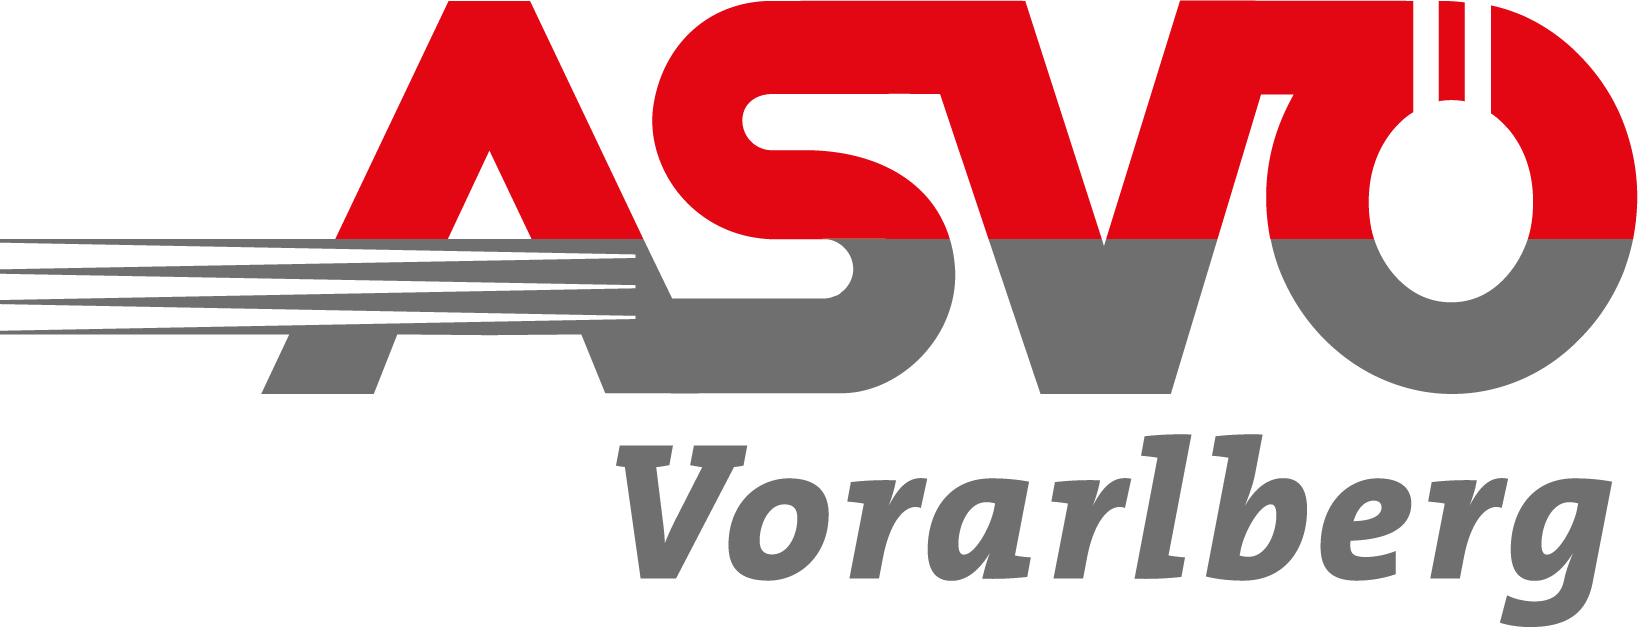 ASVOE Vorarlberg